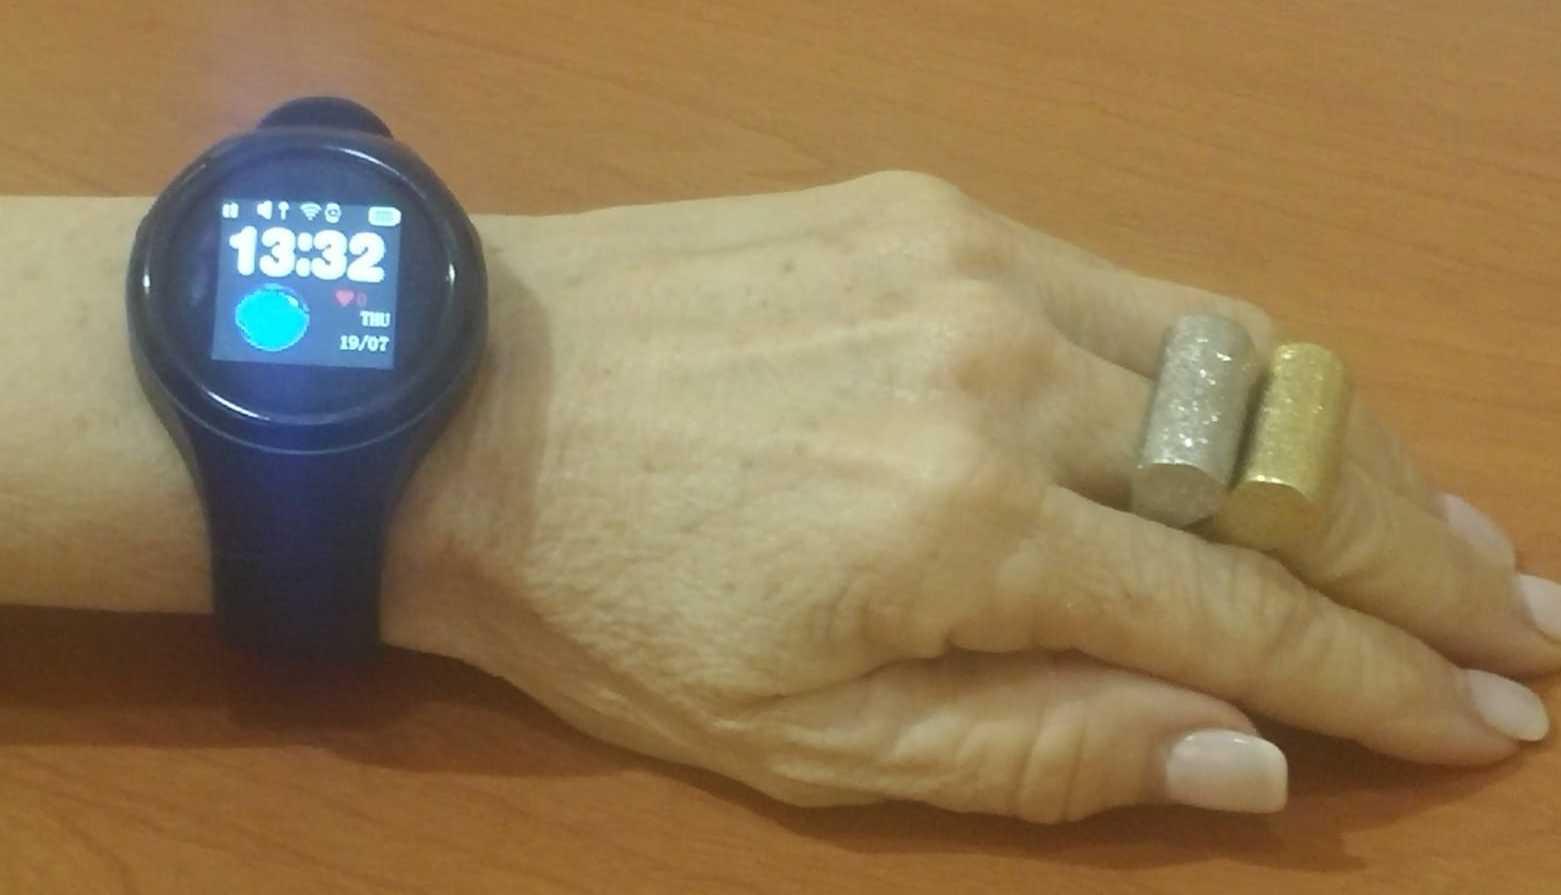 A user wears Audio HaSharon's emergency alert watch.